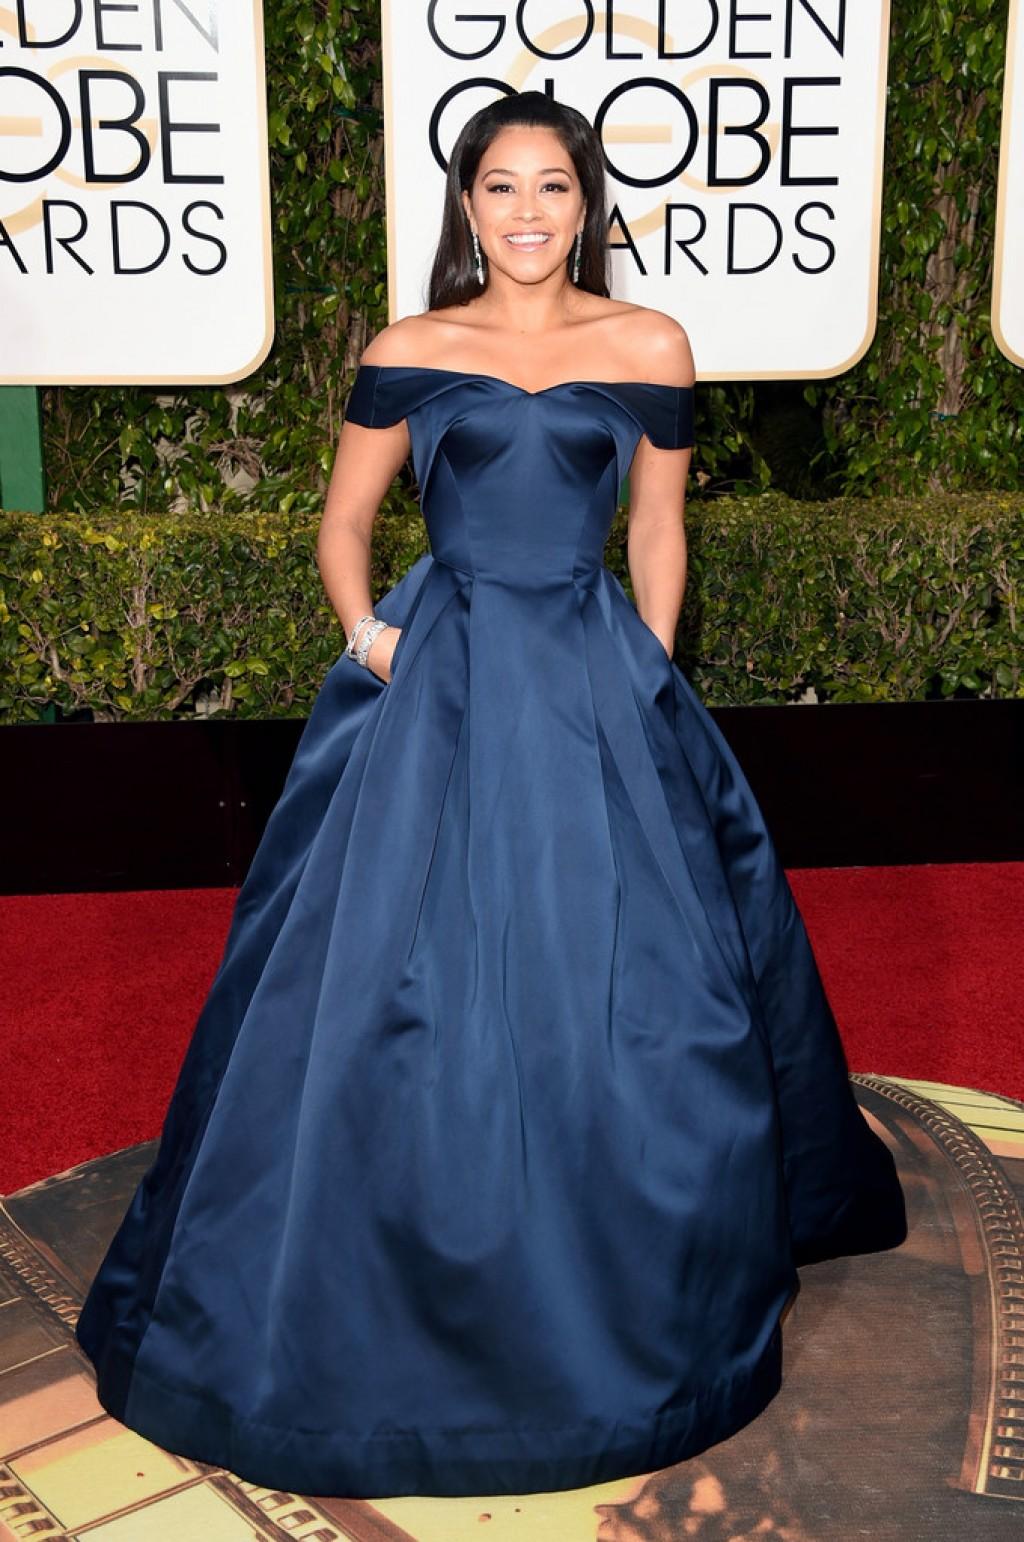 Gina-Rodriguez-in-Zac-Posen-2016-Golden-Globe-Awards-1024x1542